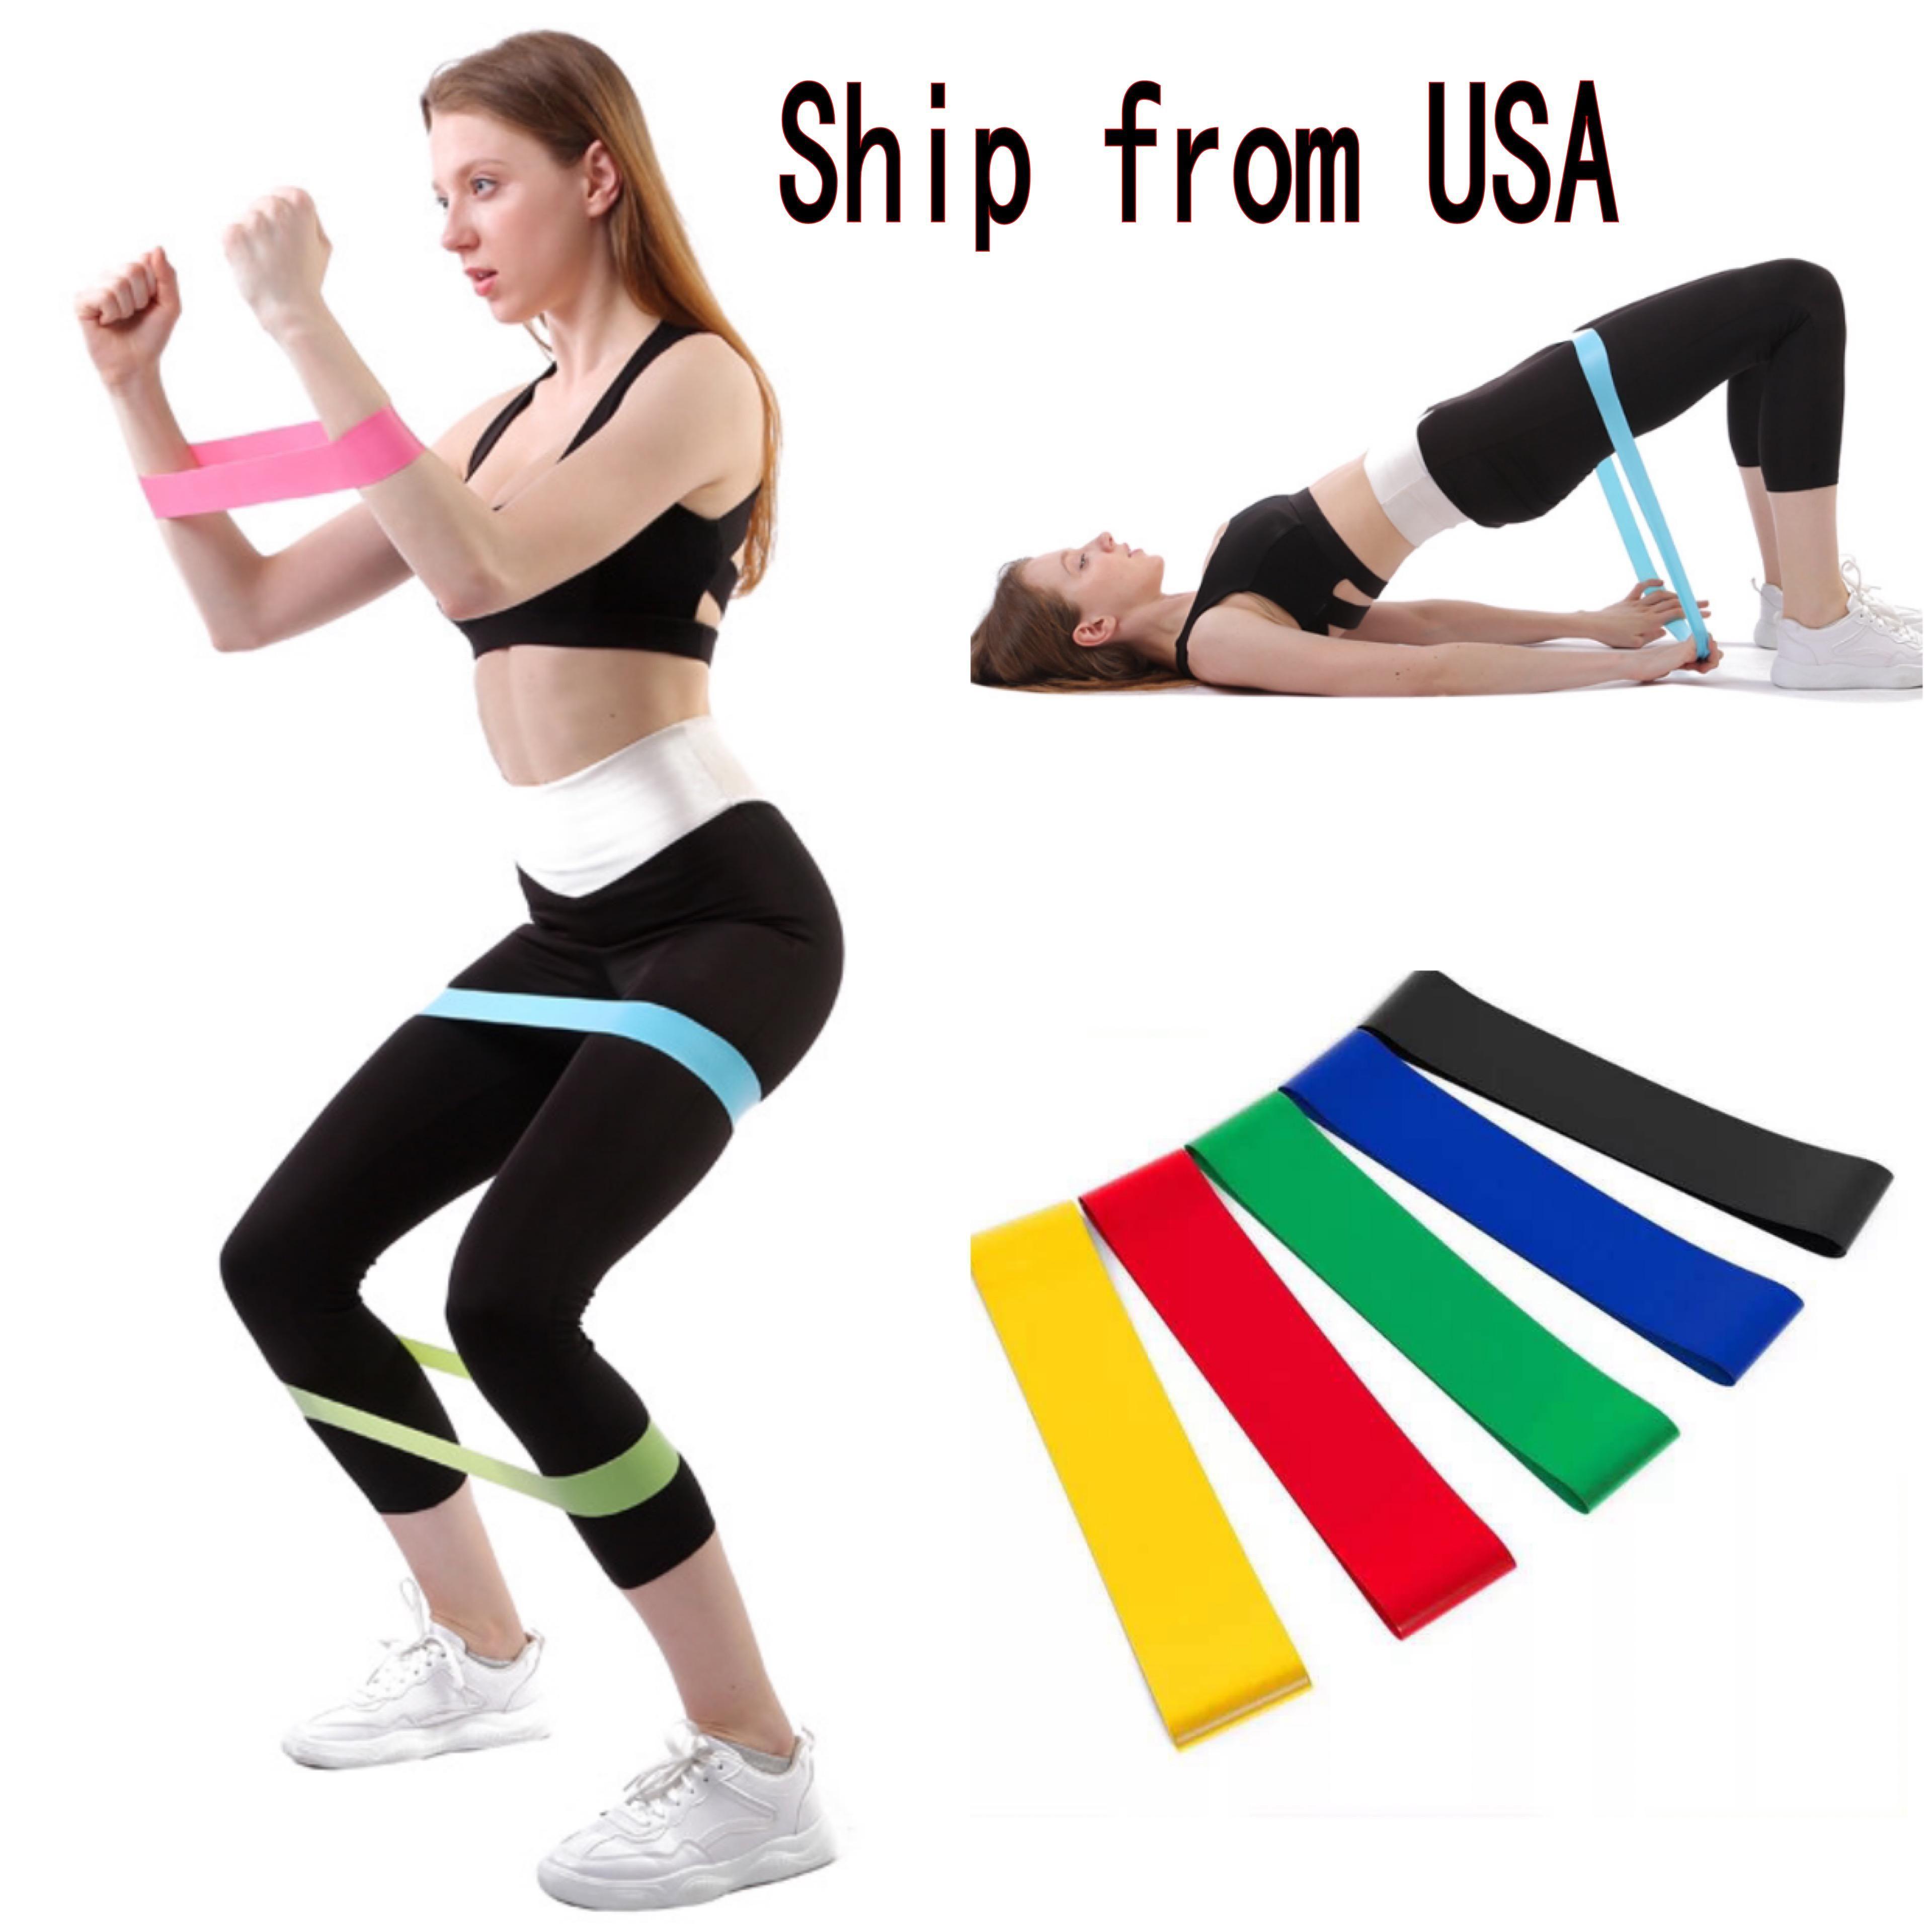 DHL Schiff 5pcs / lot Bänder eingestellt Pull Rope Levels Latex Stärke Fitness Trainingsgeräte Gummi Bodybuilding Training Band FY7008